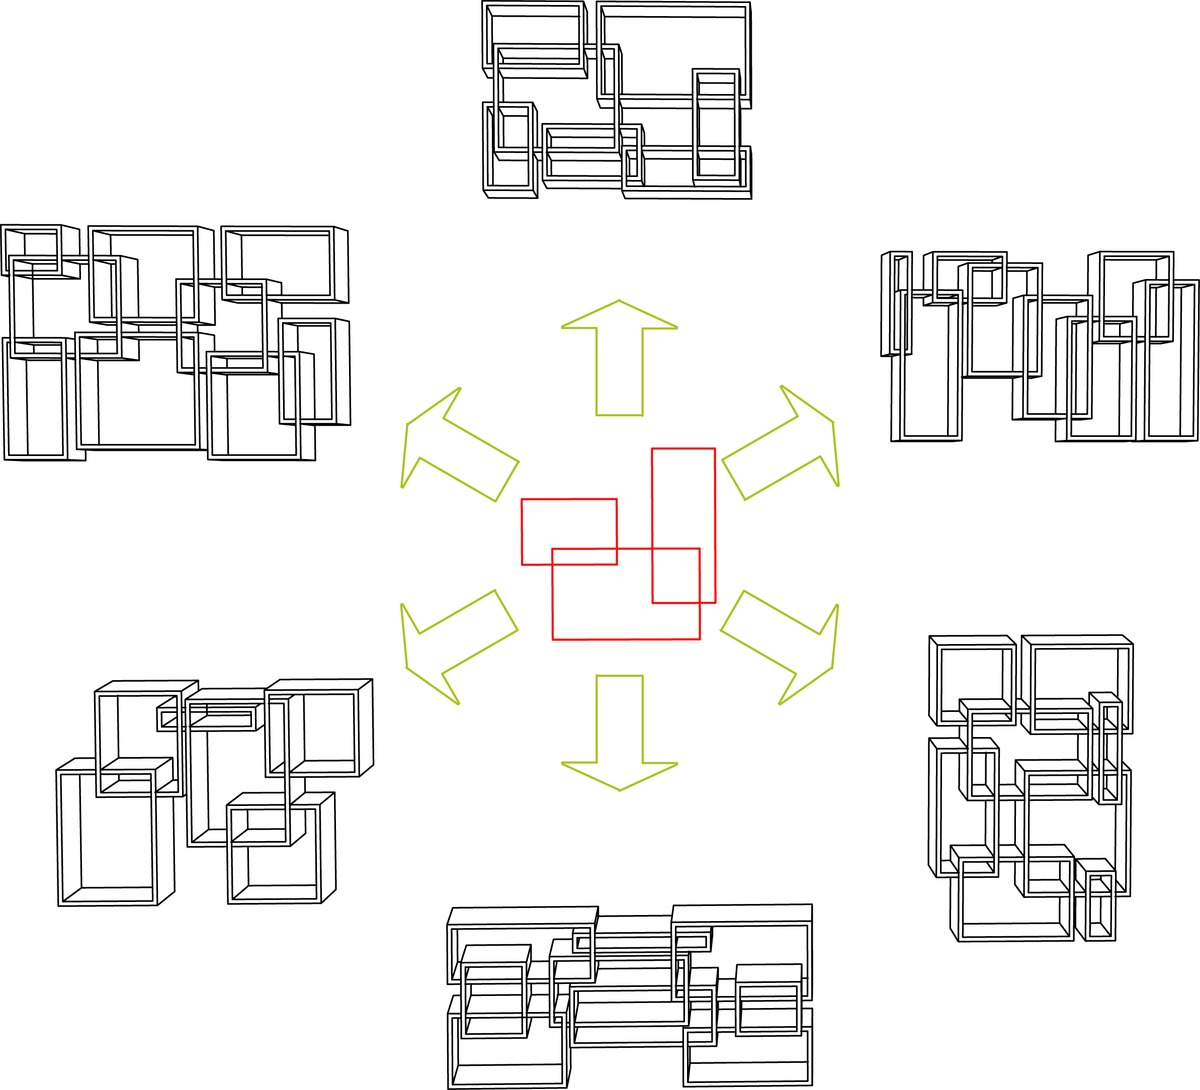 B-shelves customization framework